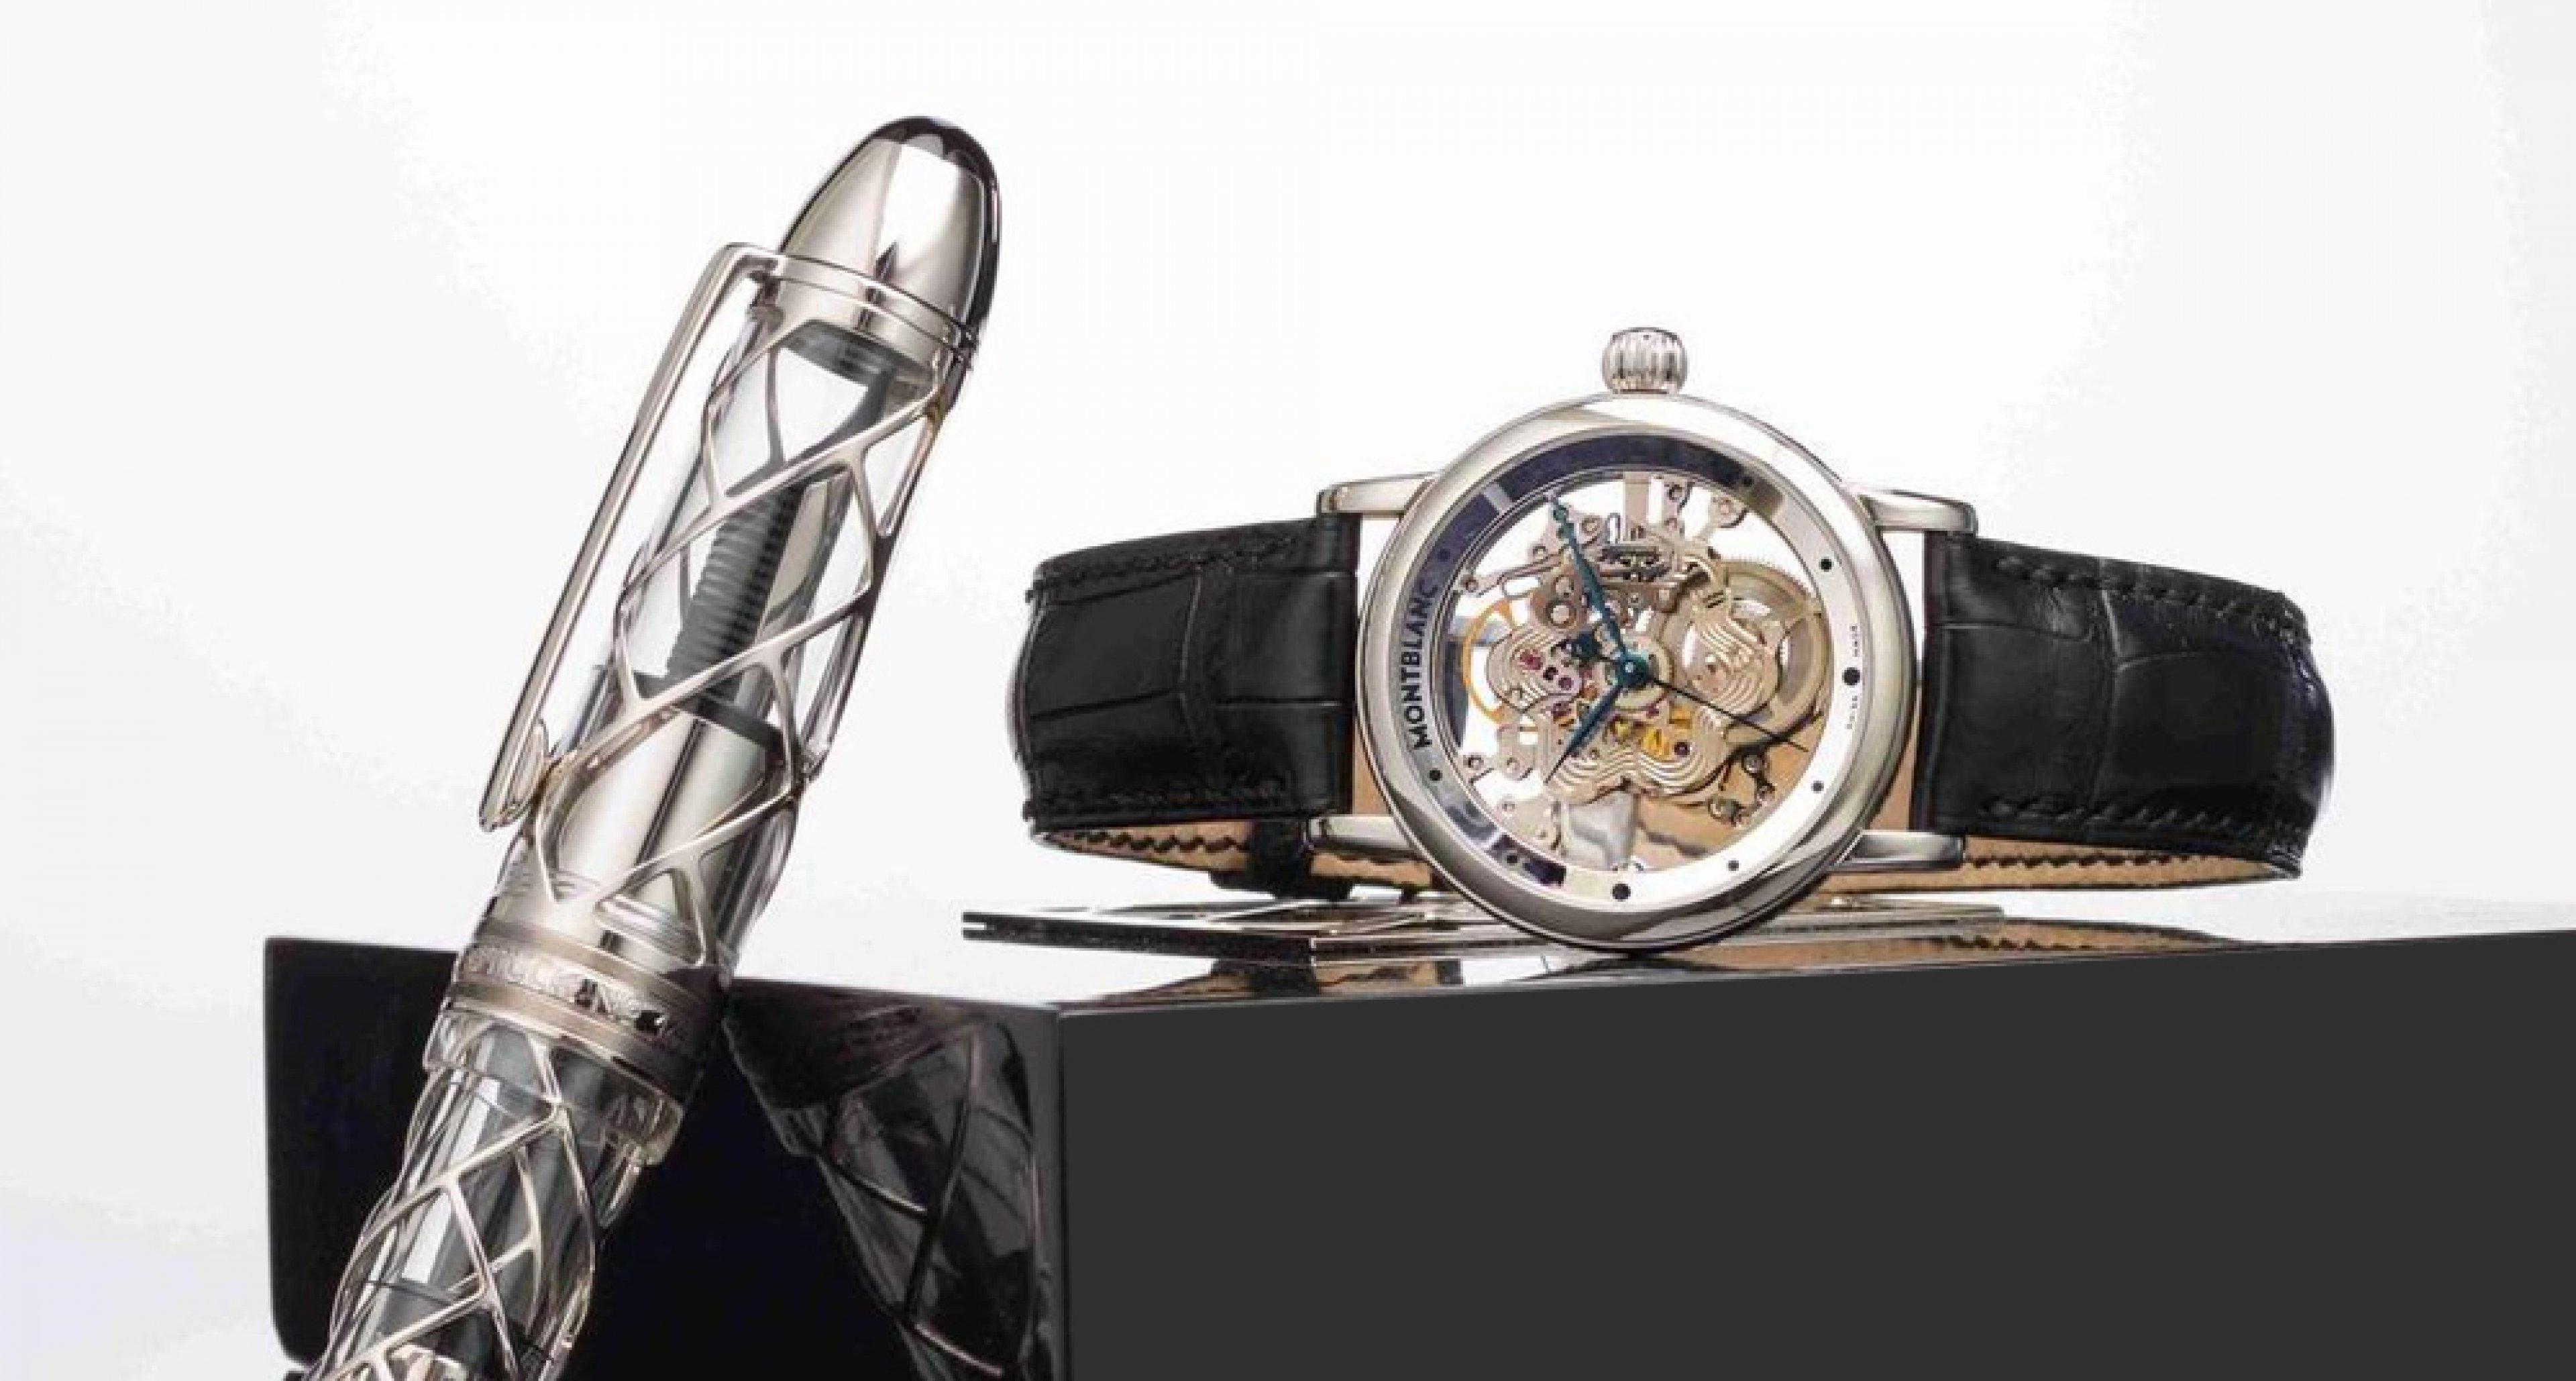 Bonhams Watches and Writing Instruments Auction in Hong Kong